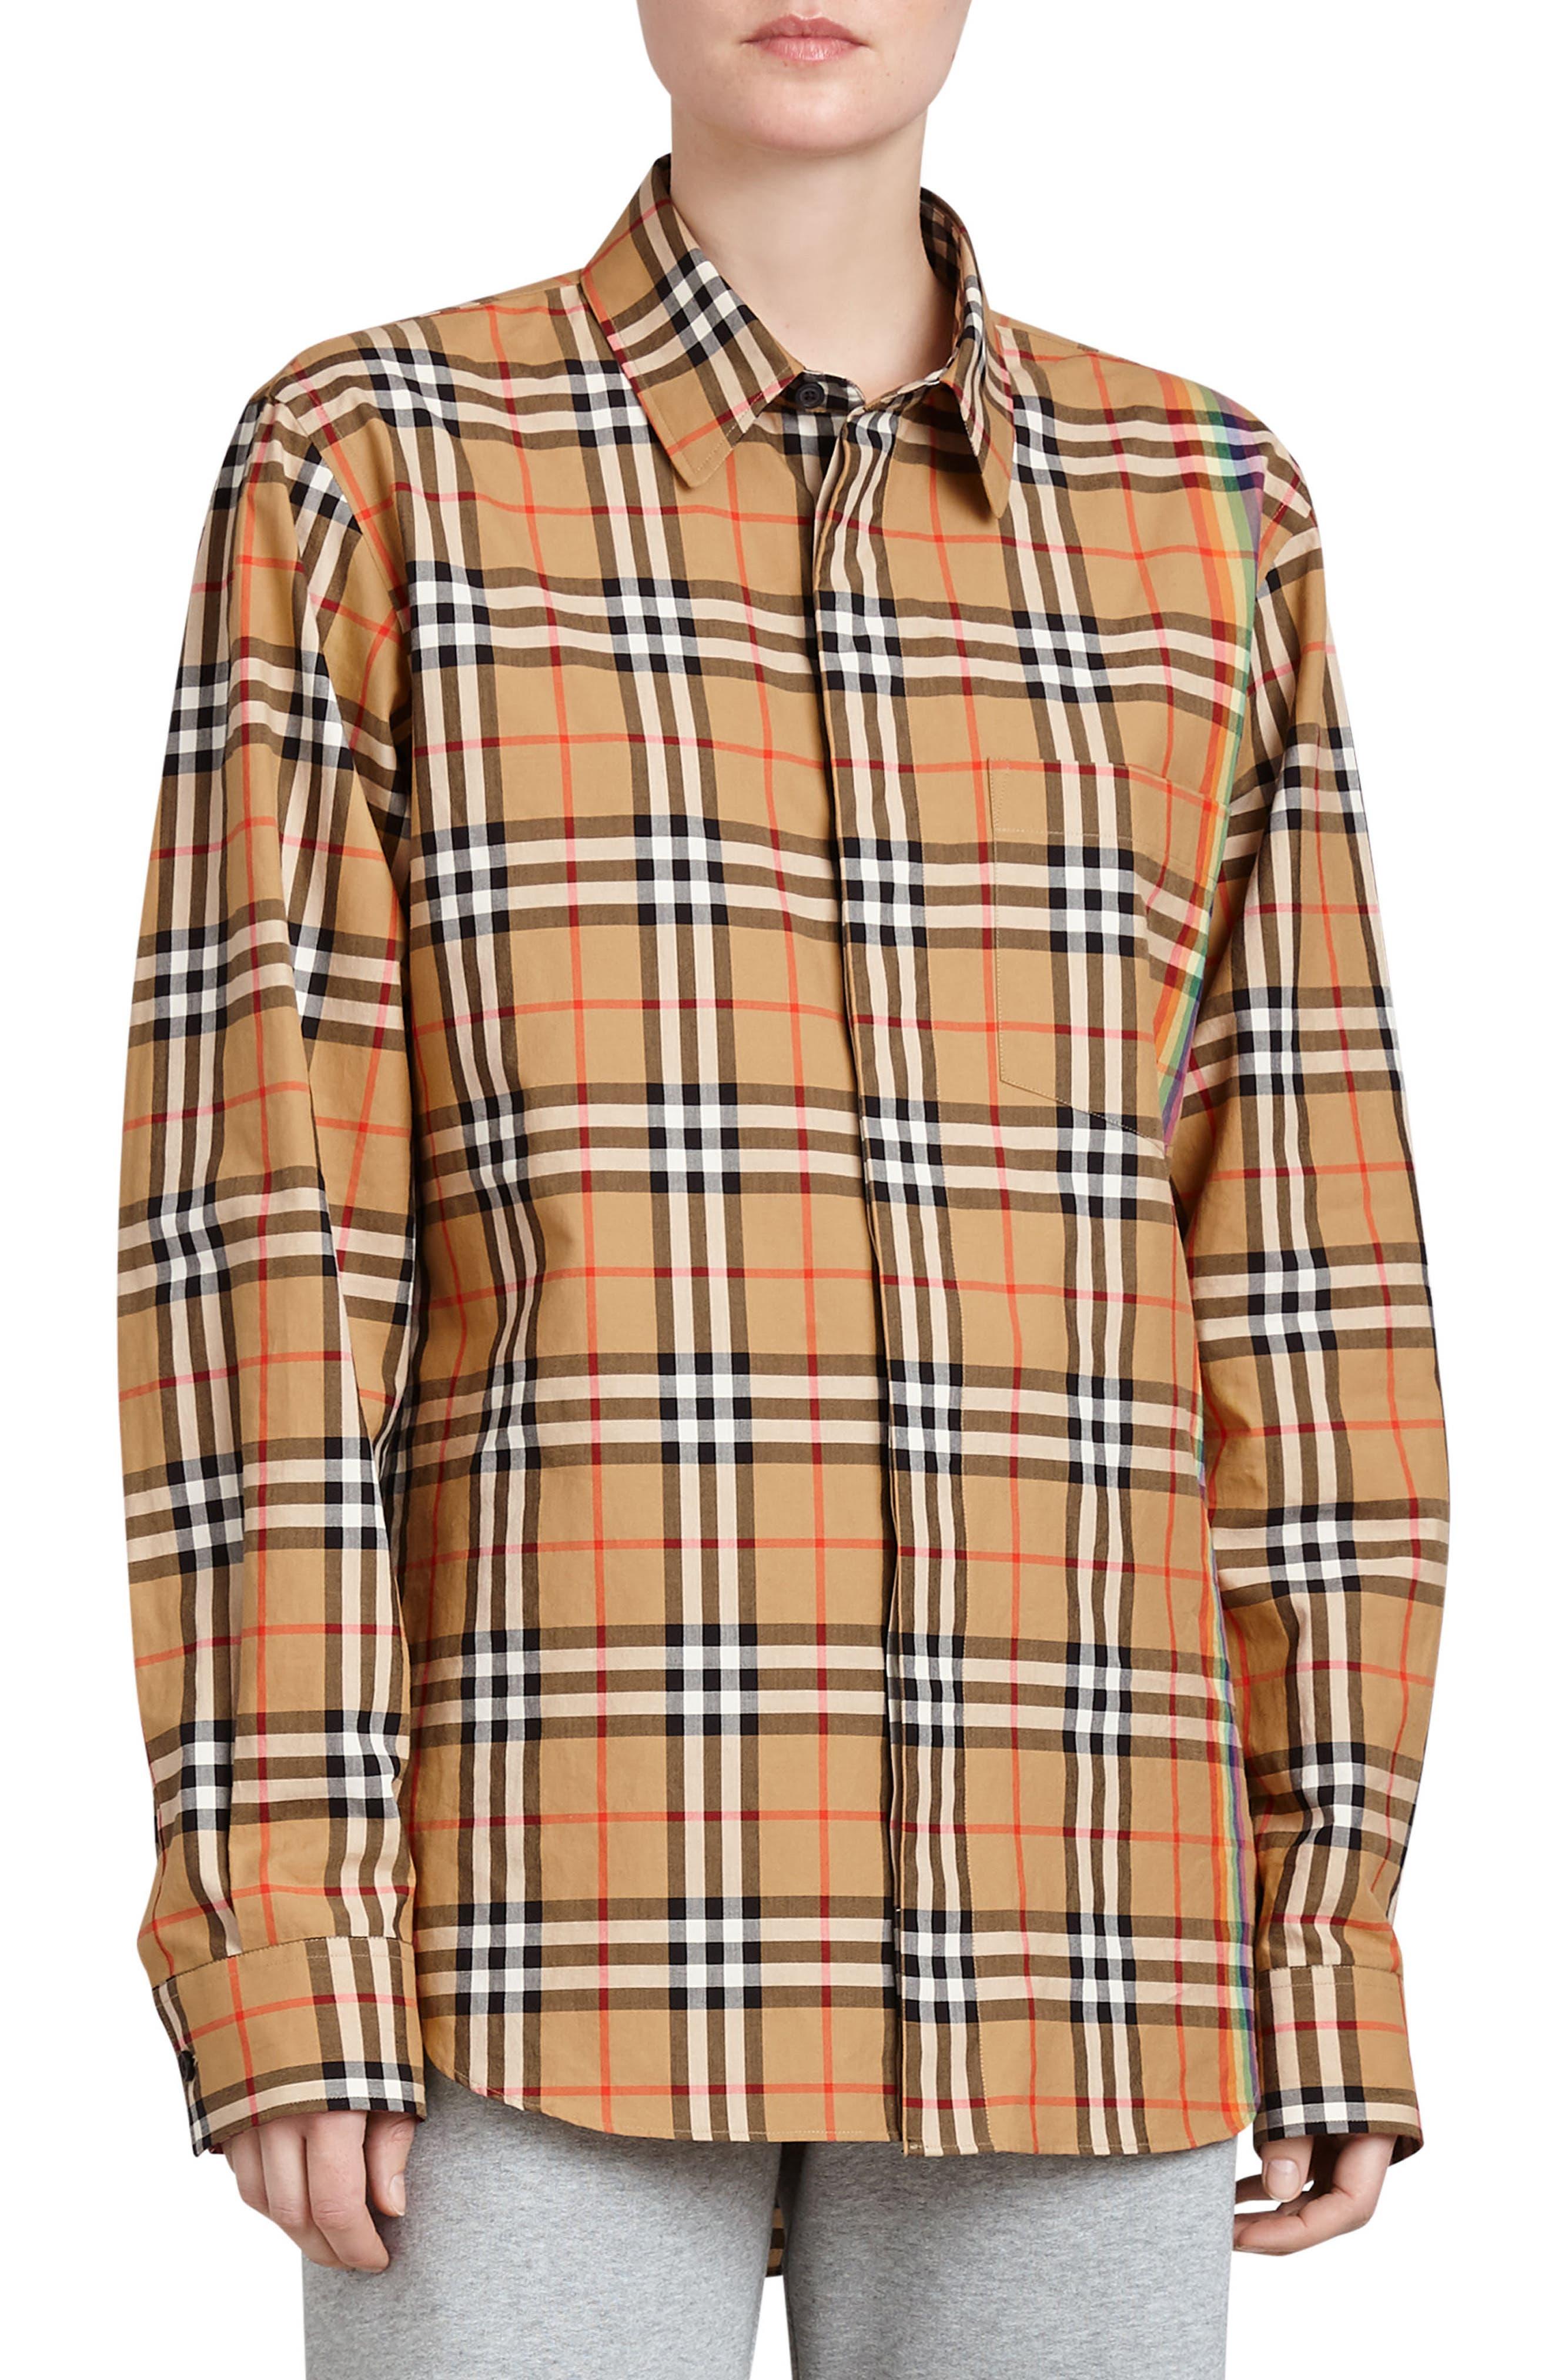 BURBERRY,                             Rainbow Check Shirt,                             Main thumbnail 1, color,                             254